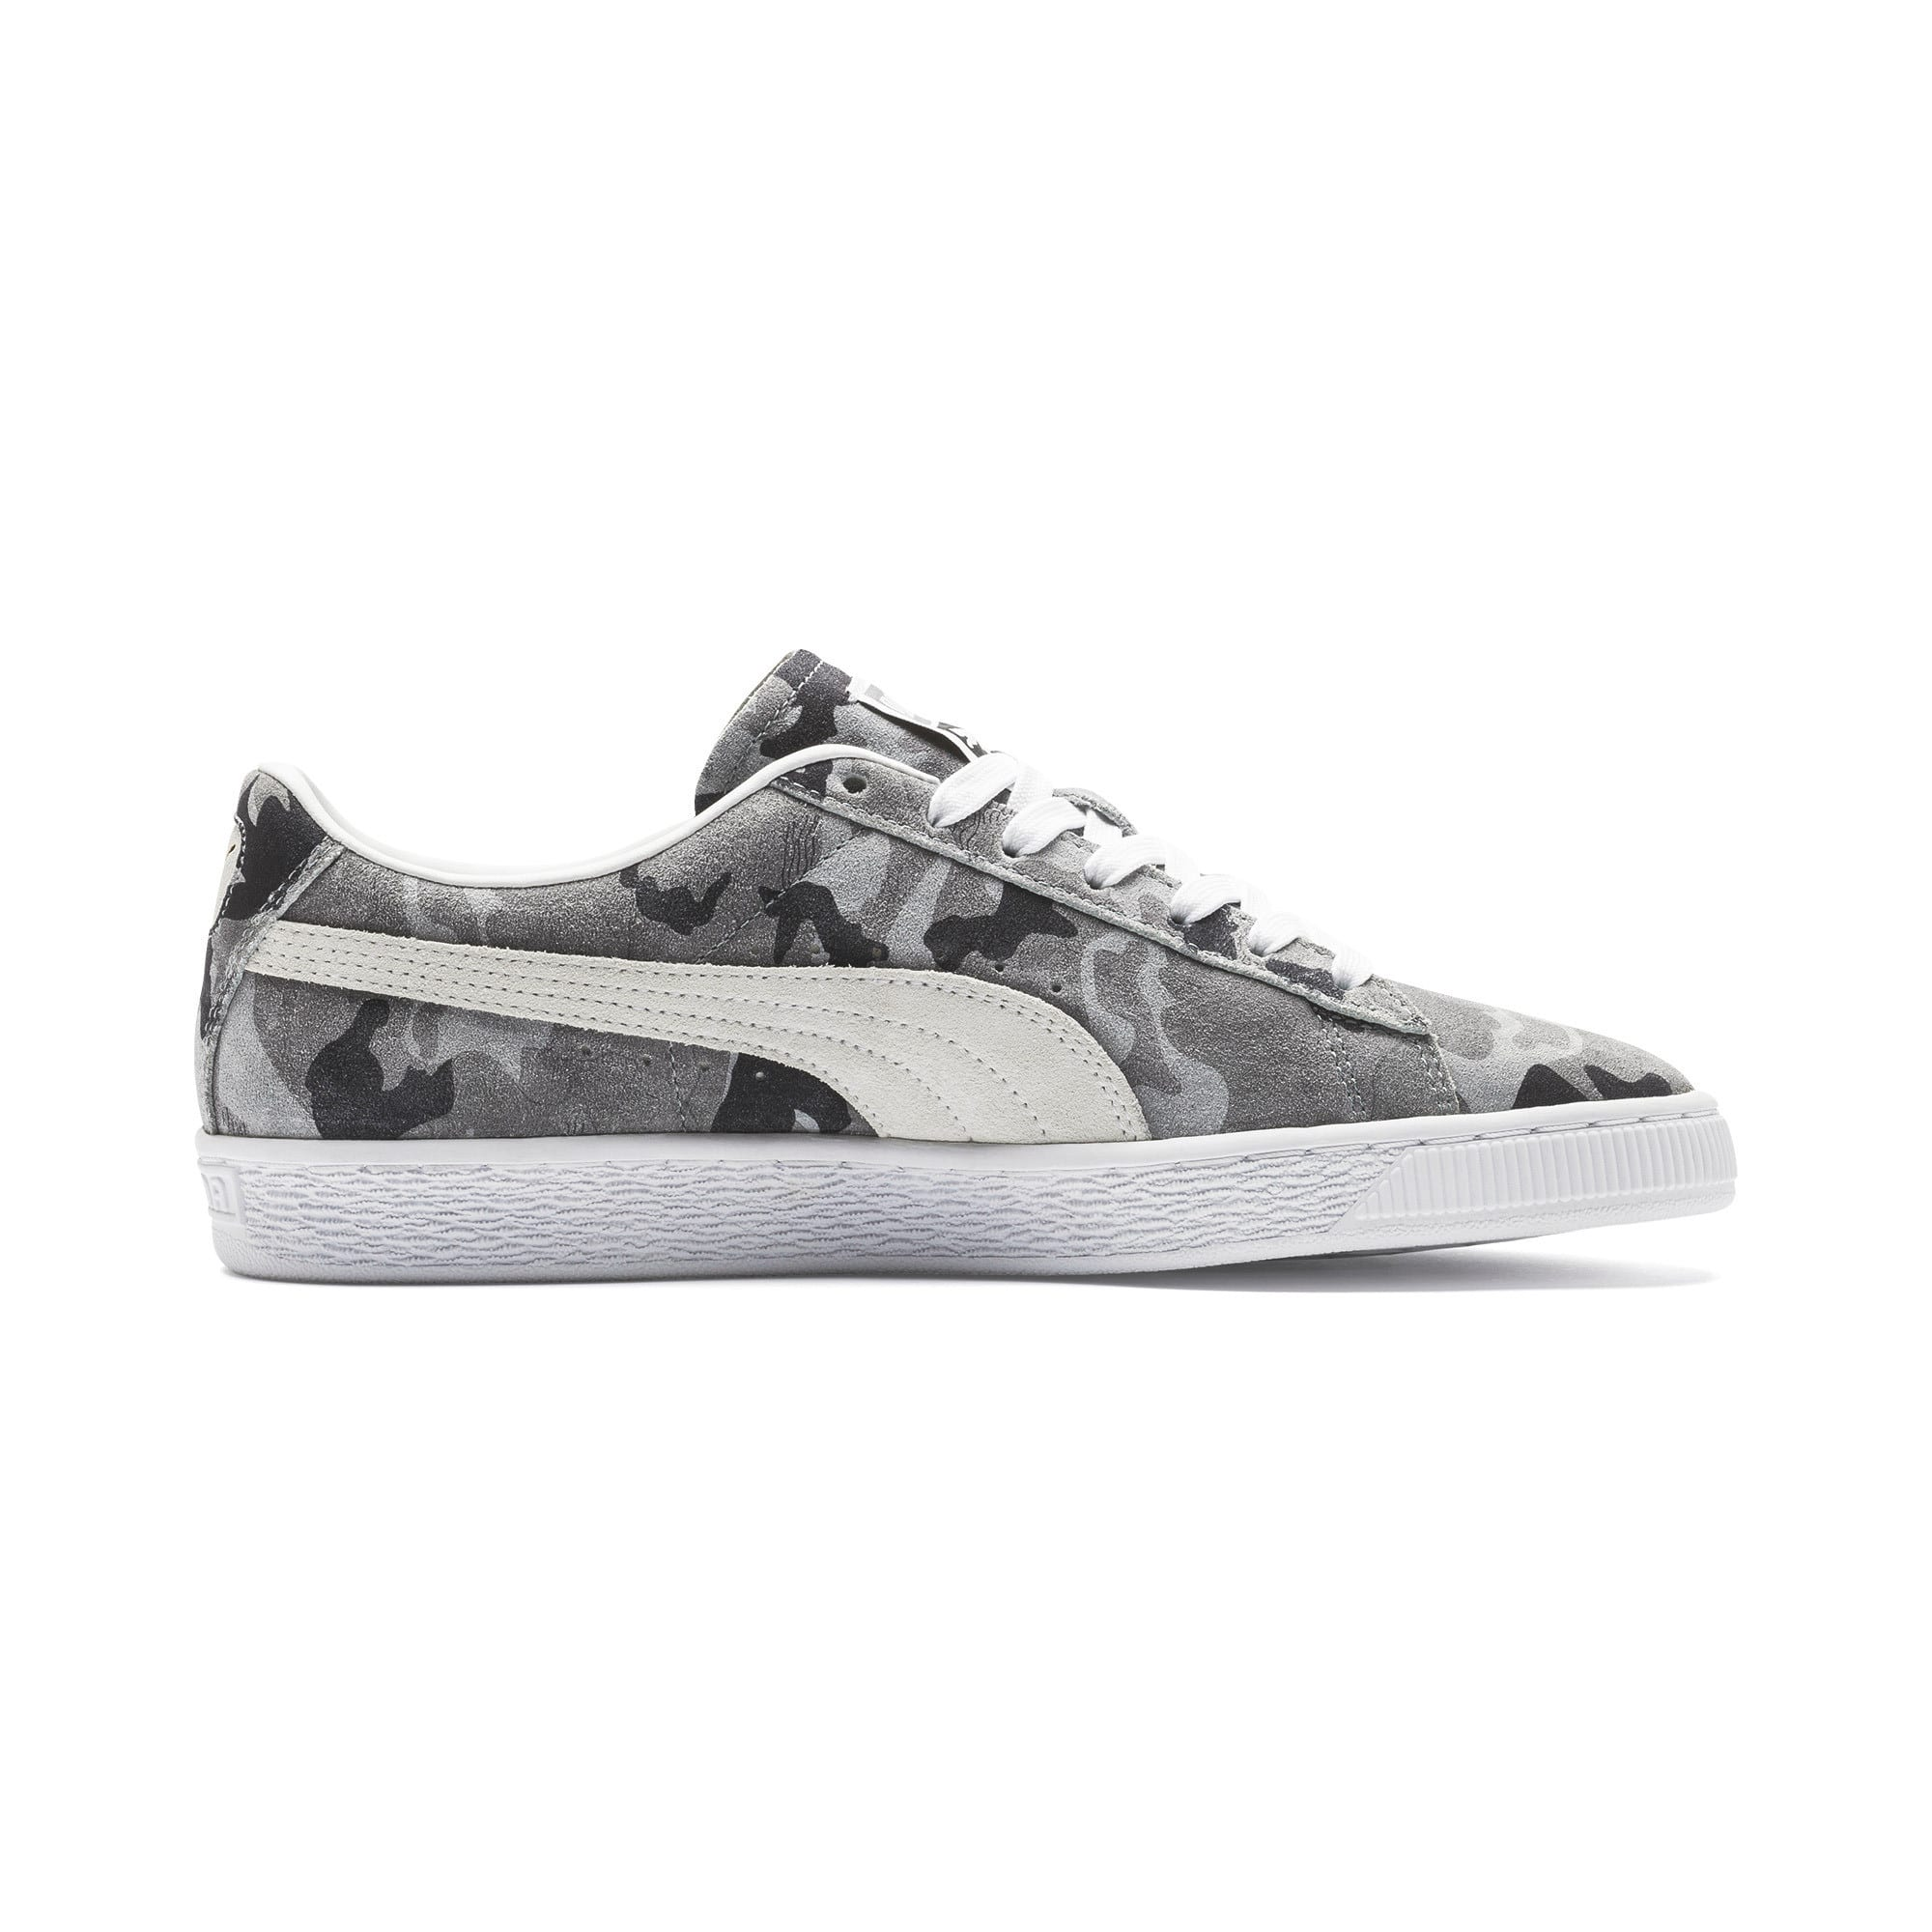 Thumbnail 5 of Suede Classic Ambush Sneakers, Puma Black-CASTLEROCK-White, medium